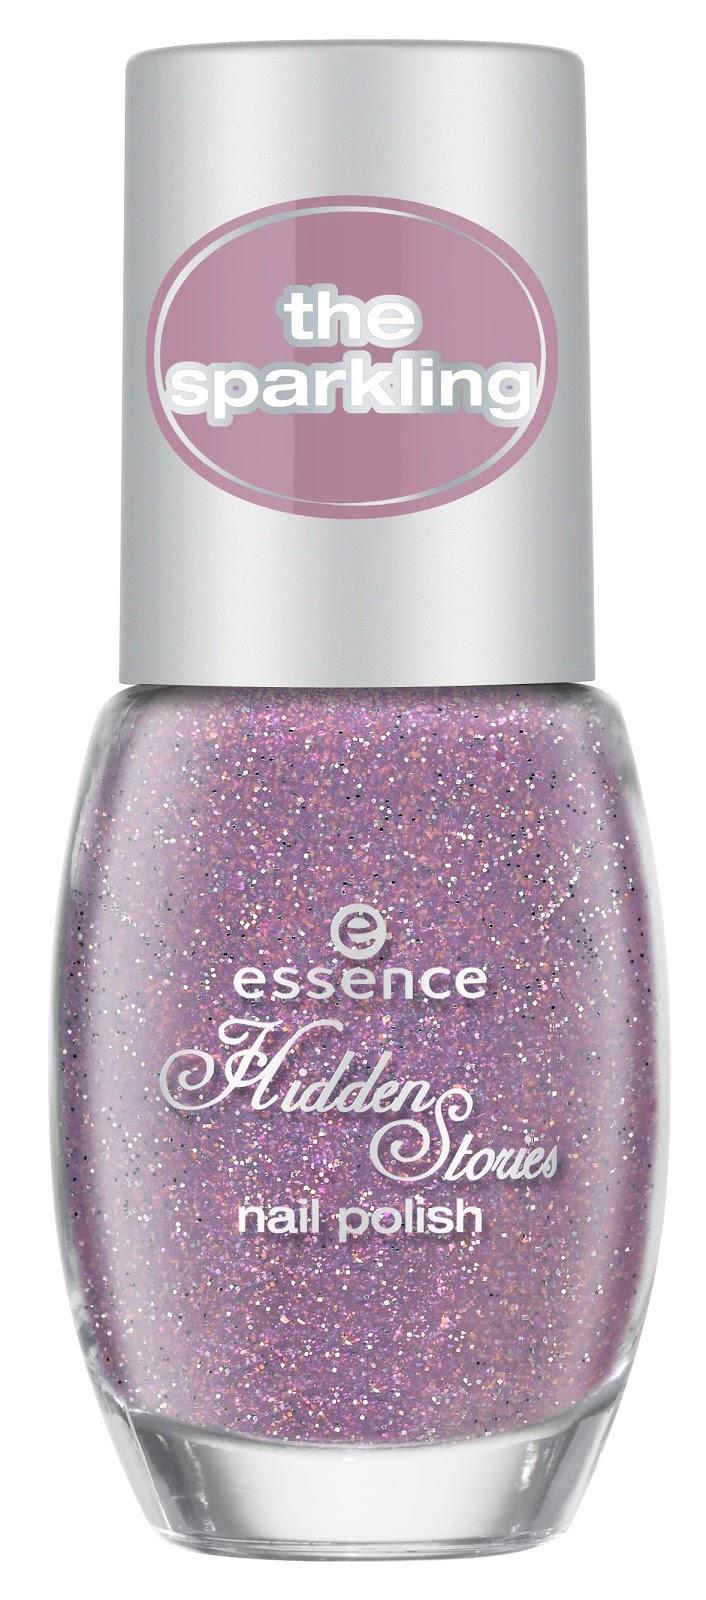 Essence Hidden Stories nail polish